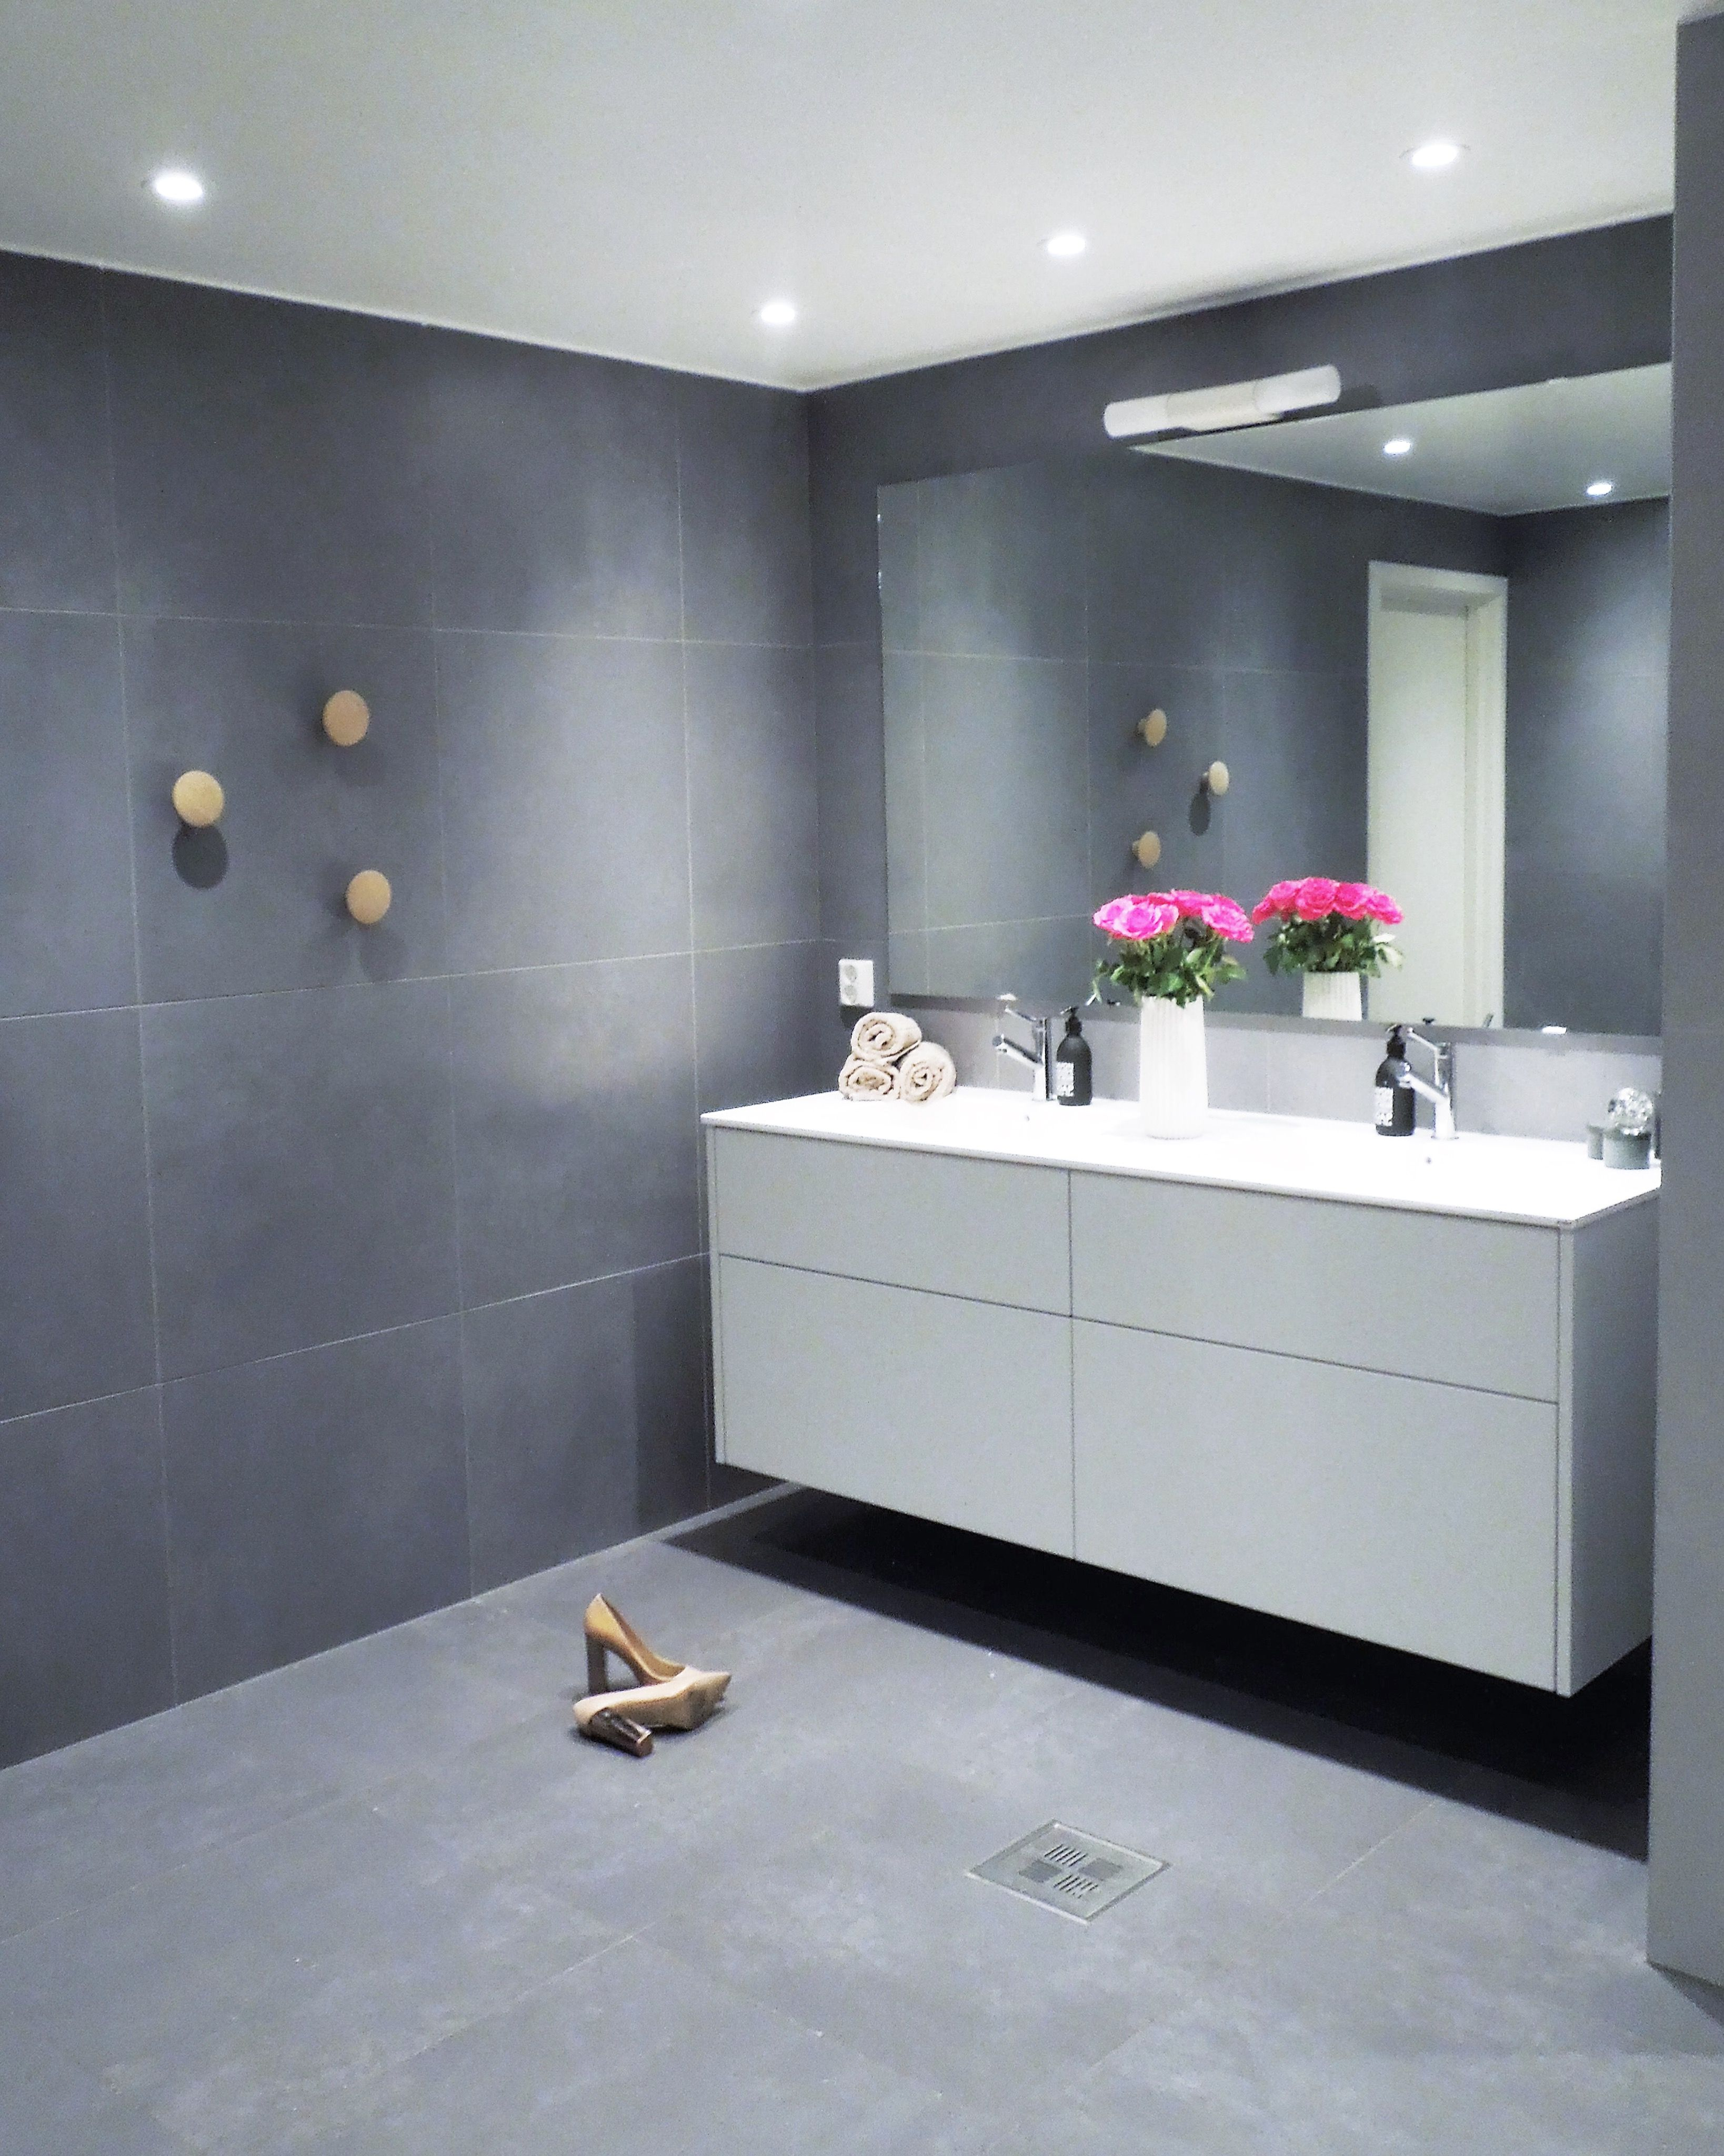 How To Create A Greyscale Bathroom: IG: @frutanem #bathroom #minimalism #nordic #interior